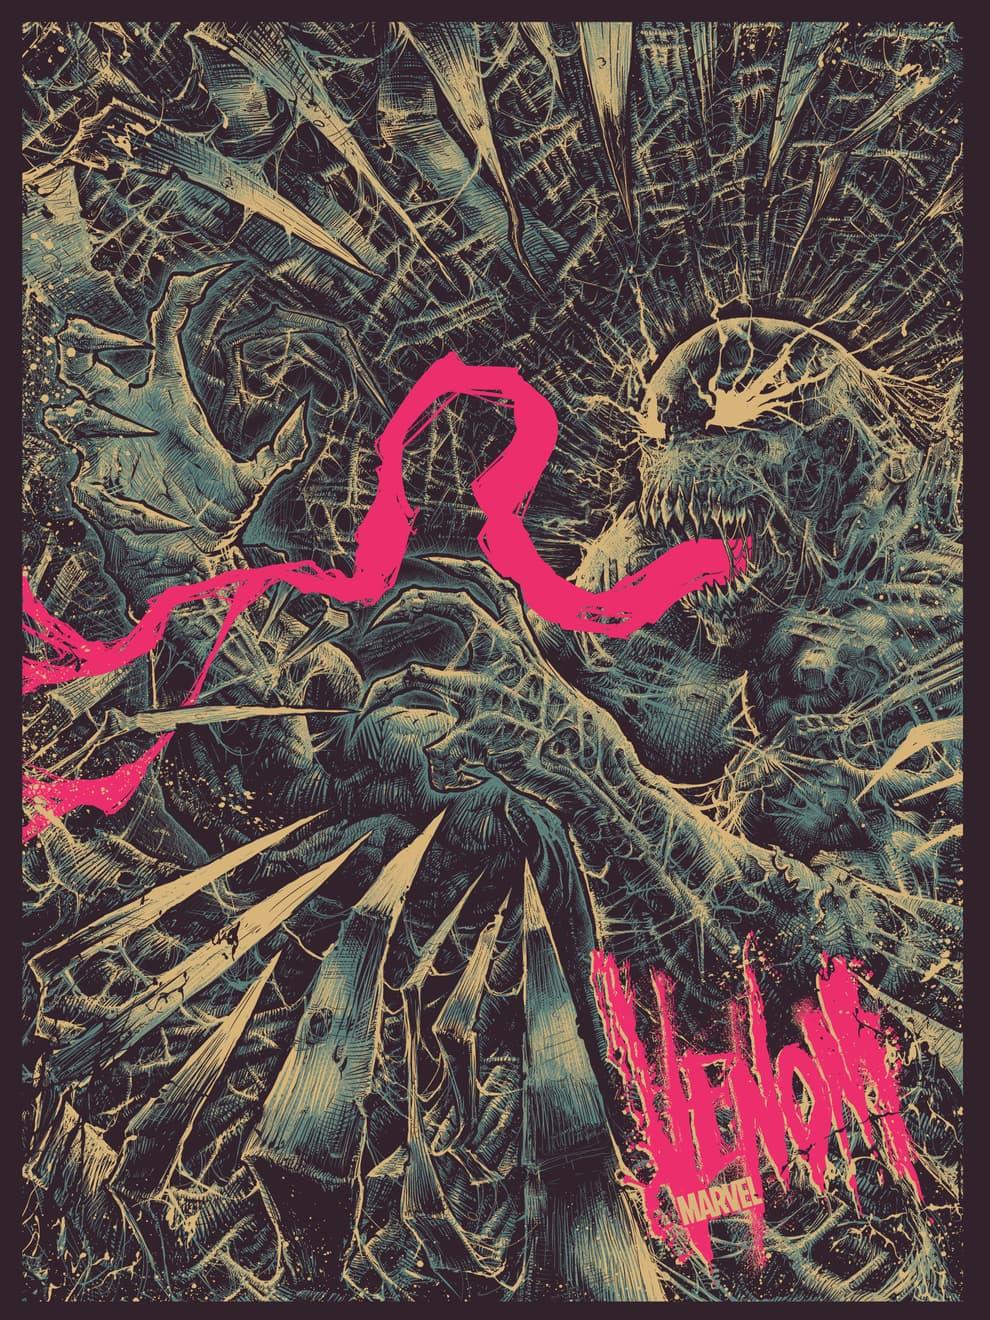 Venom by Godmachine